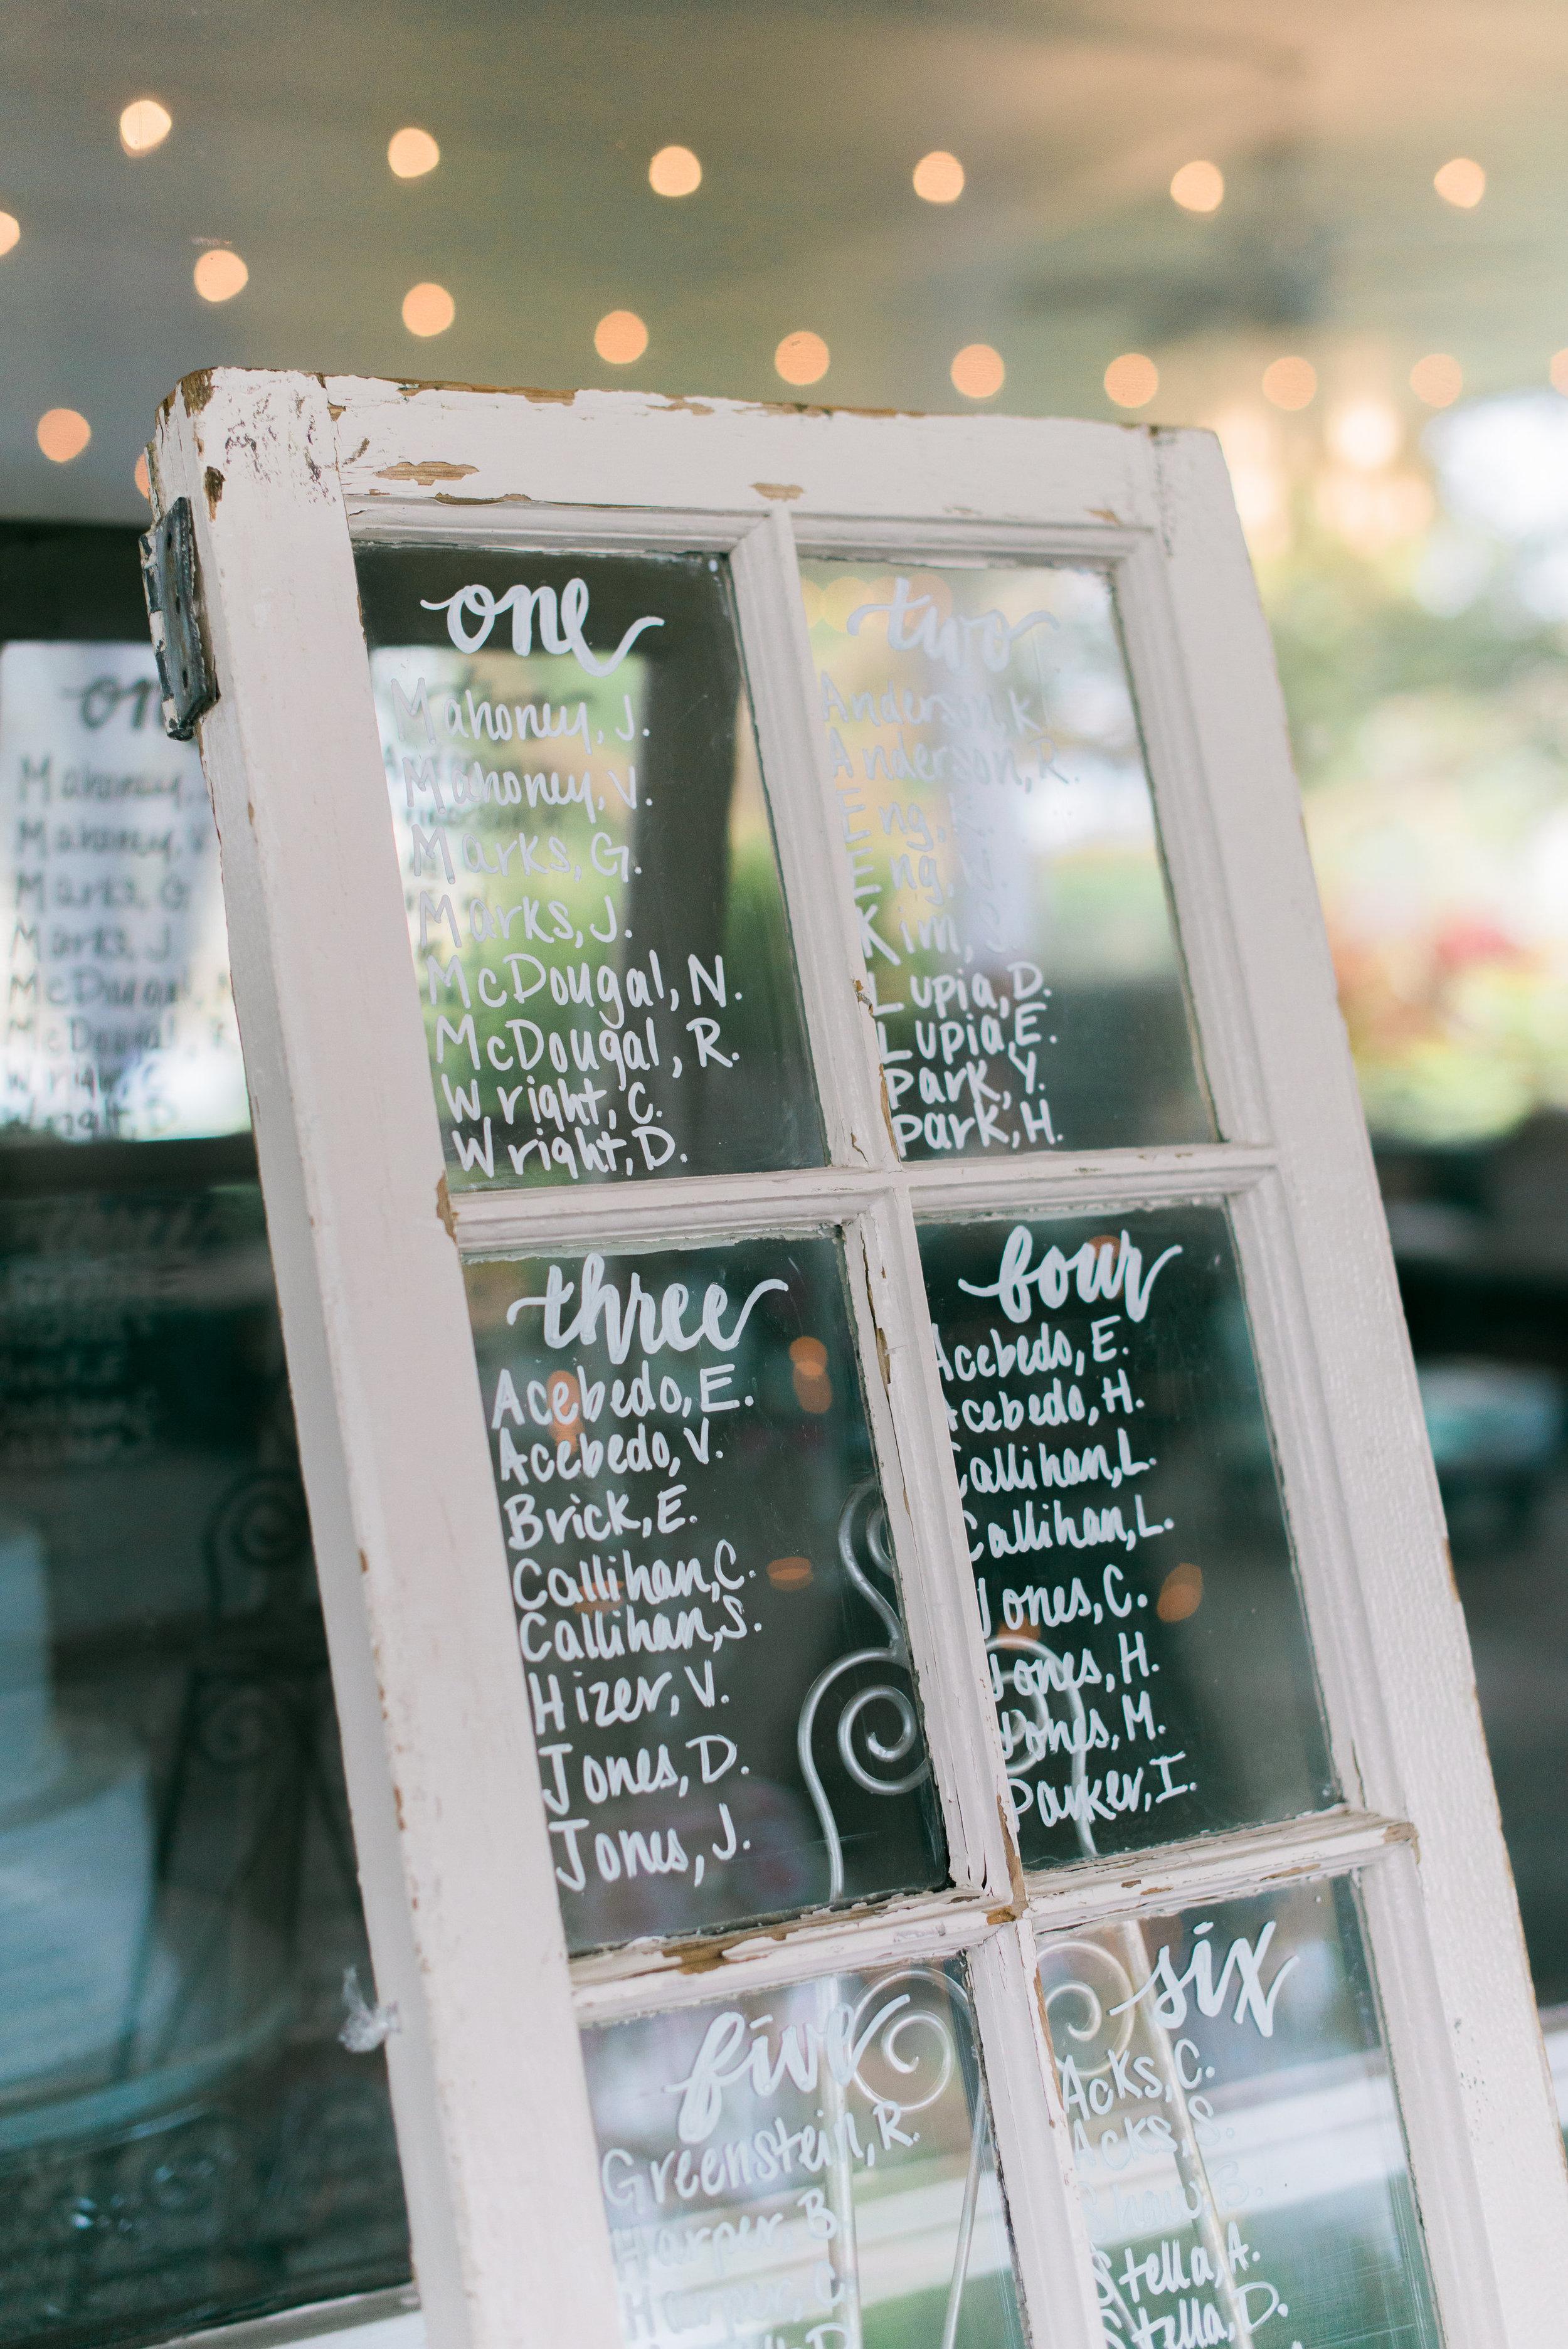 winsor event studio window pane seating chart wedding